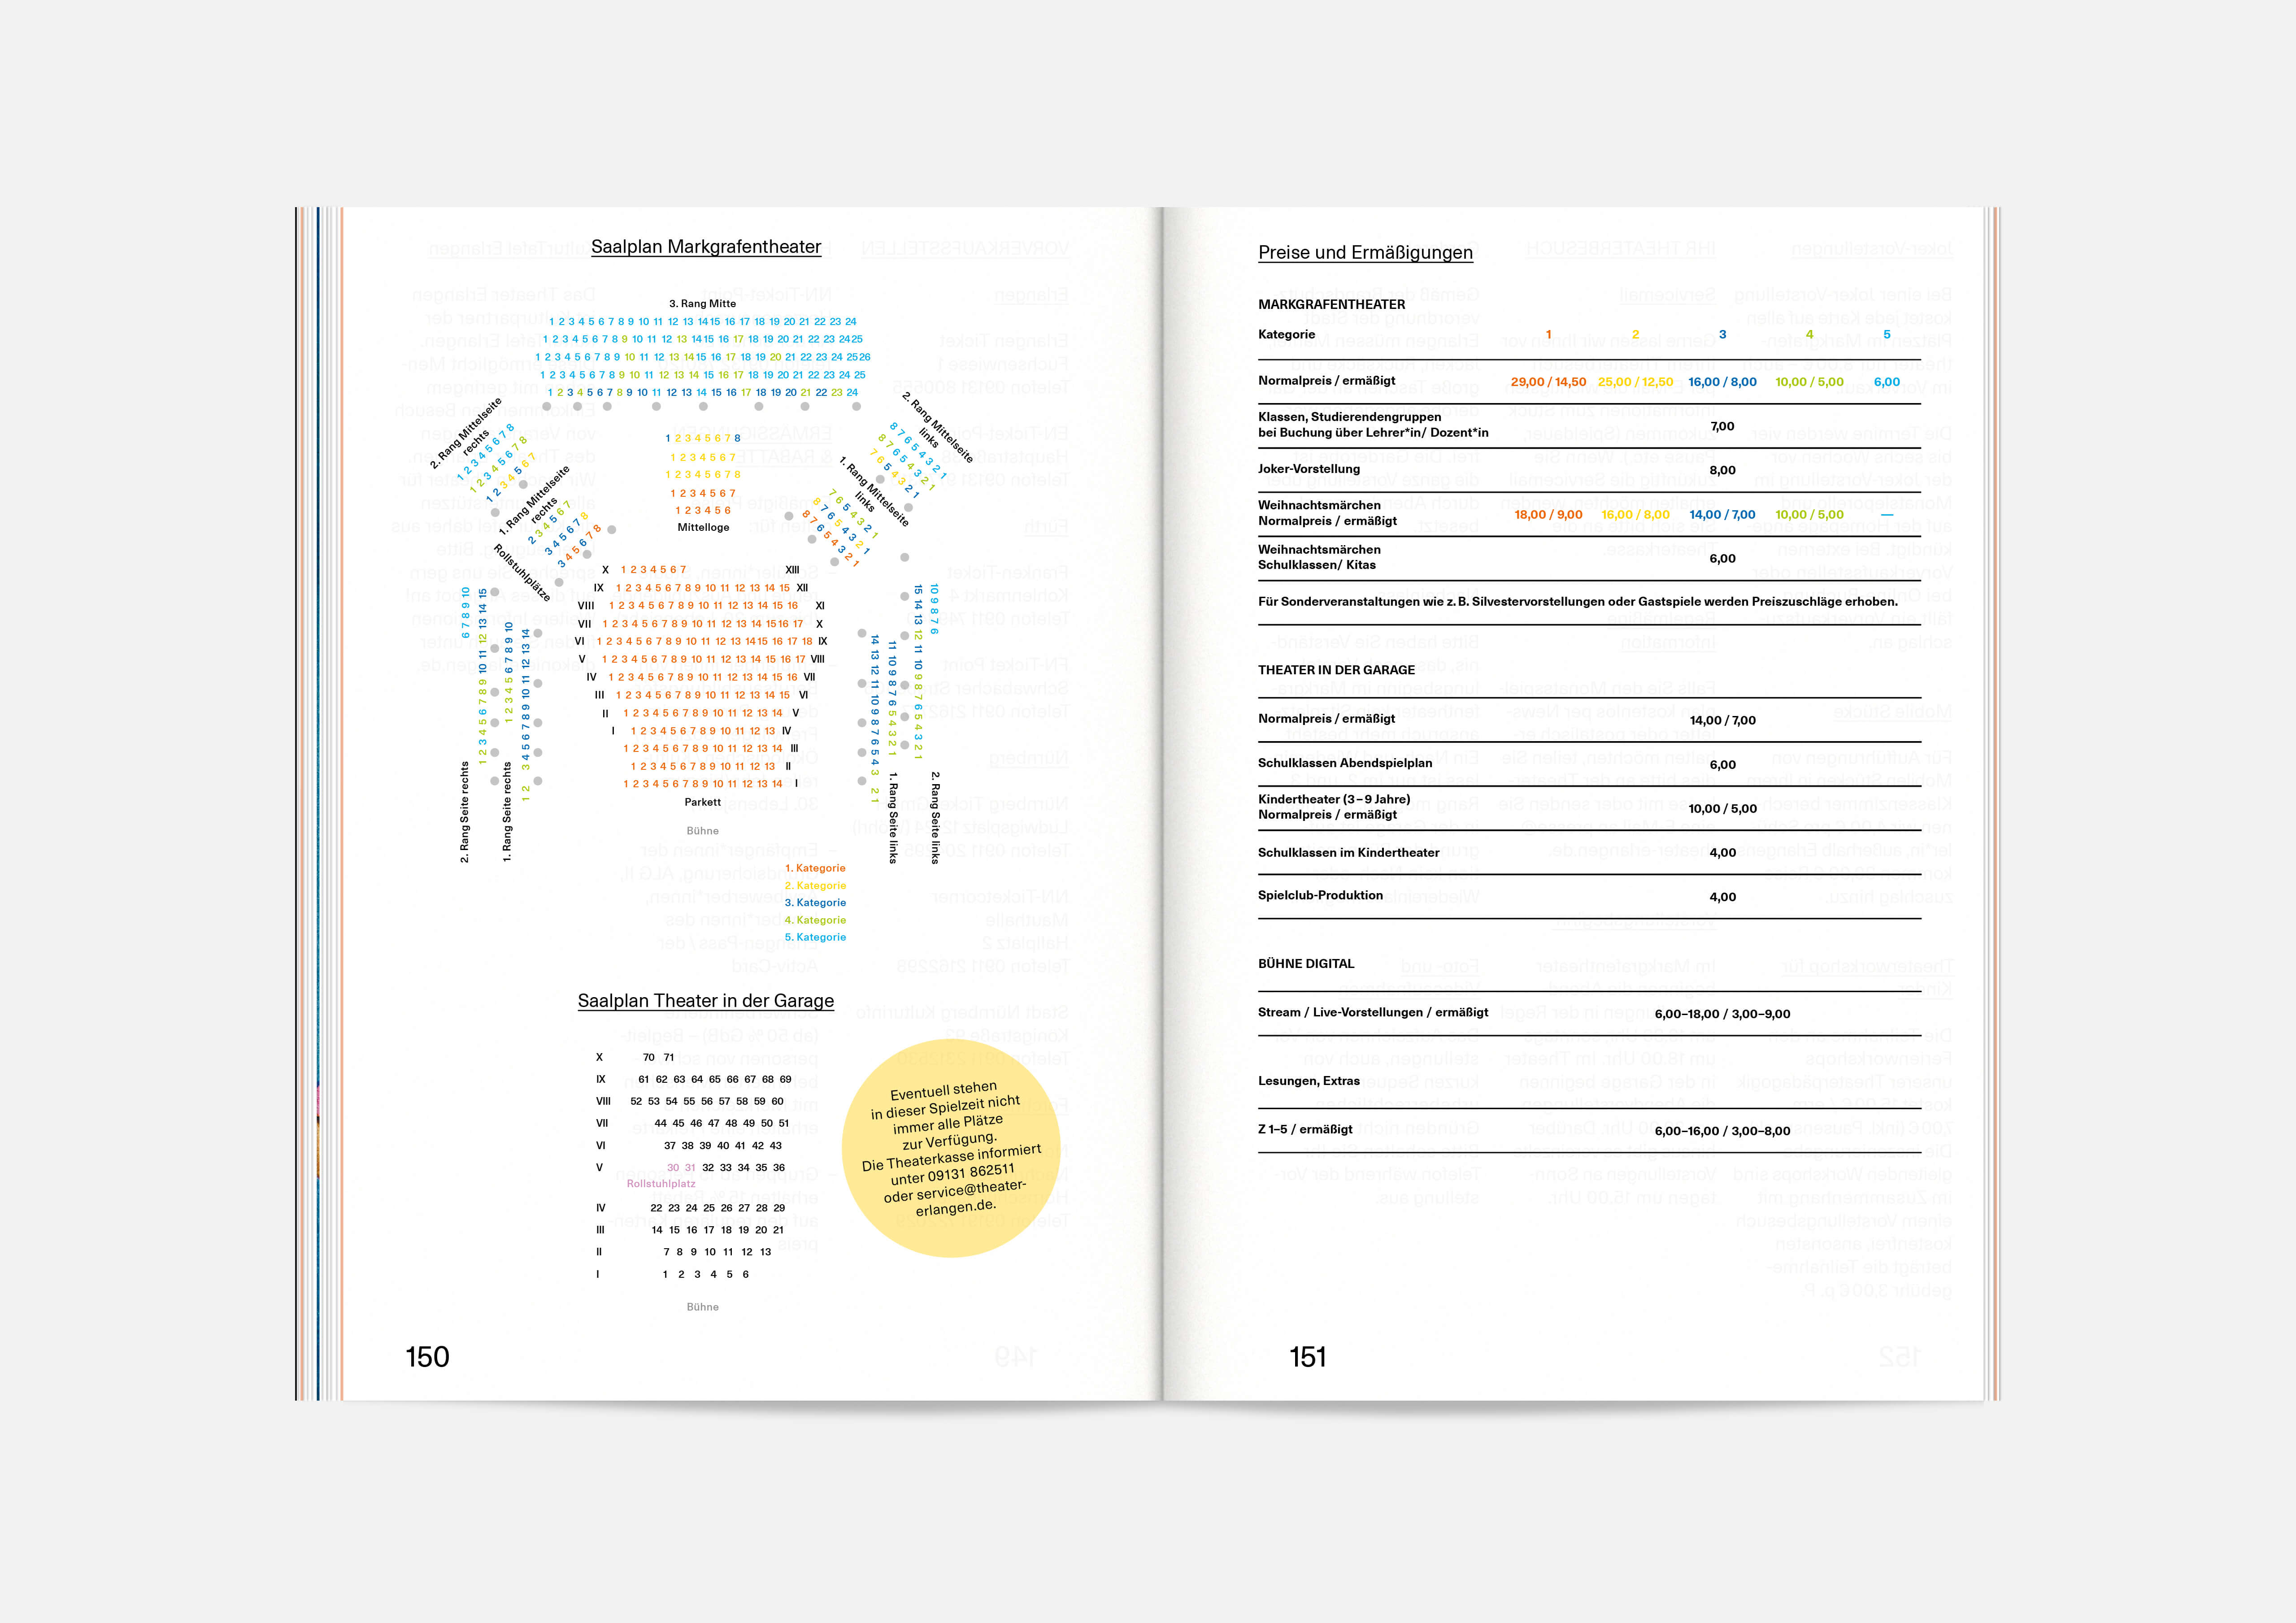 https://neuegestaltung.de/media/pages/clients/theater-erlangen-seasonal-program-2021-22/fb70e9f1a1-1630497302/te-szh-202122_34.jpg